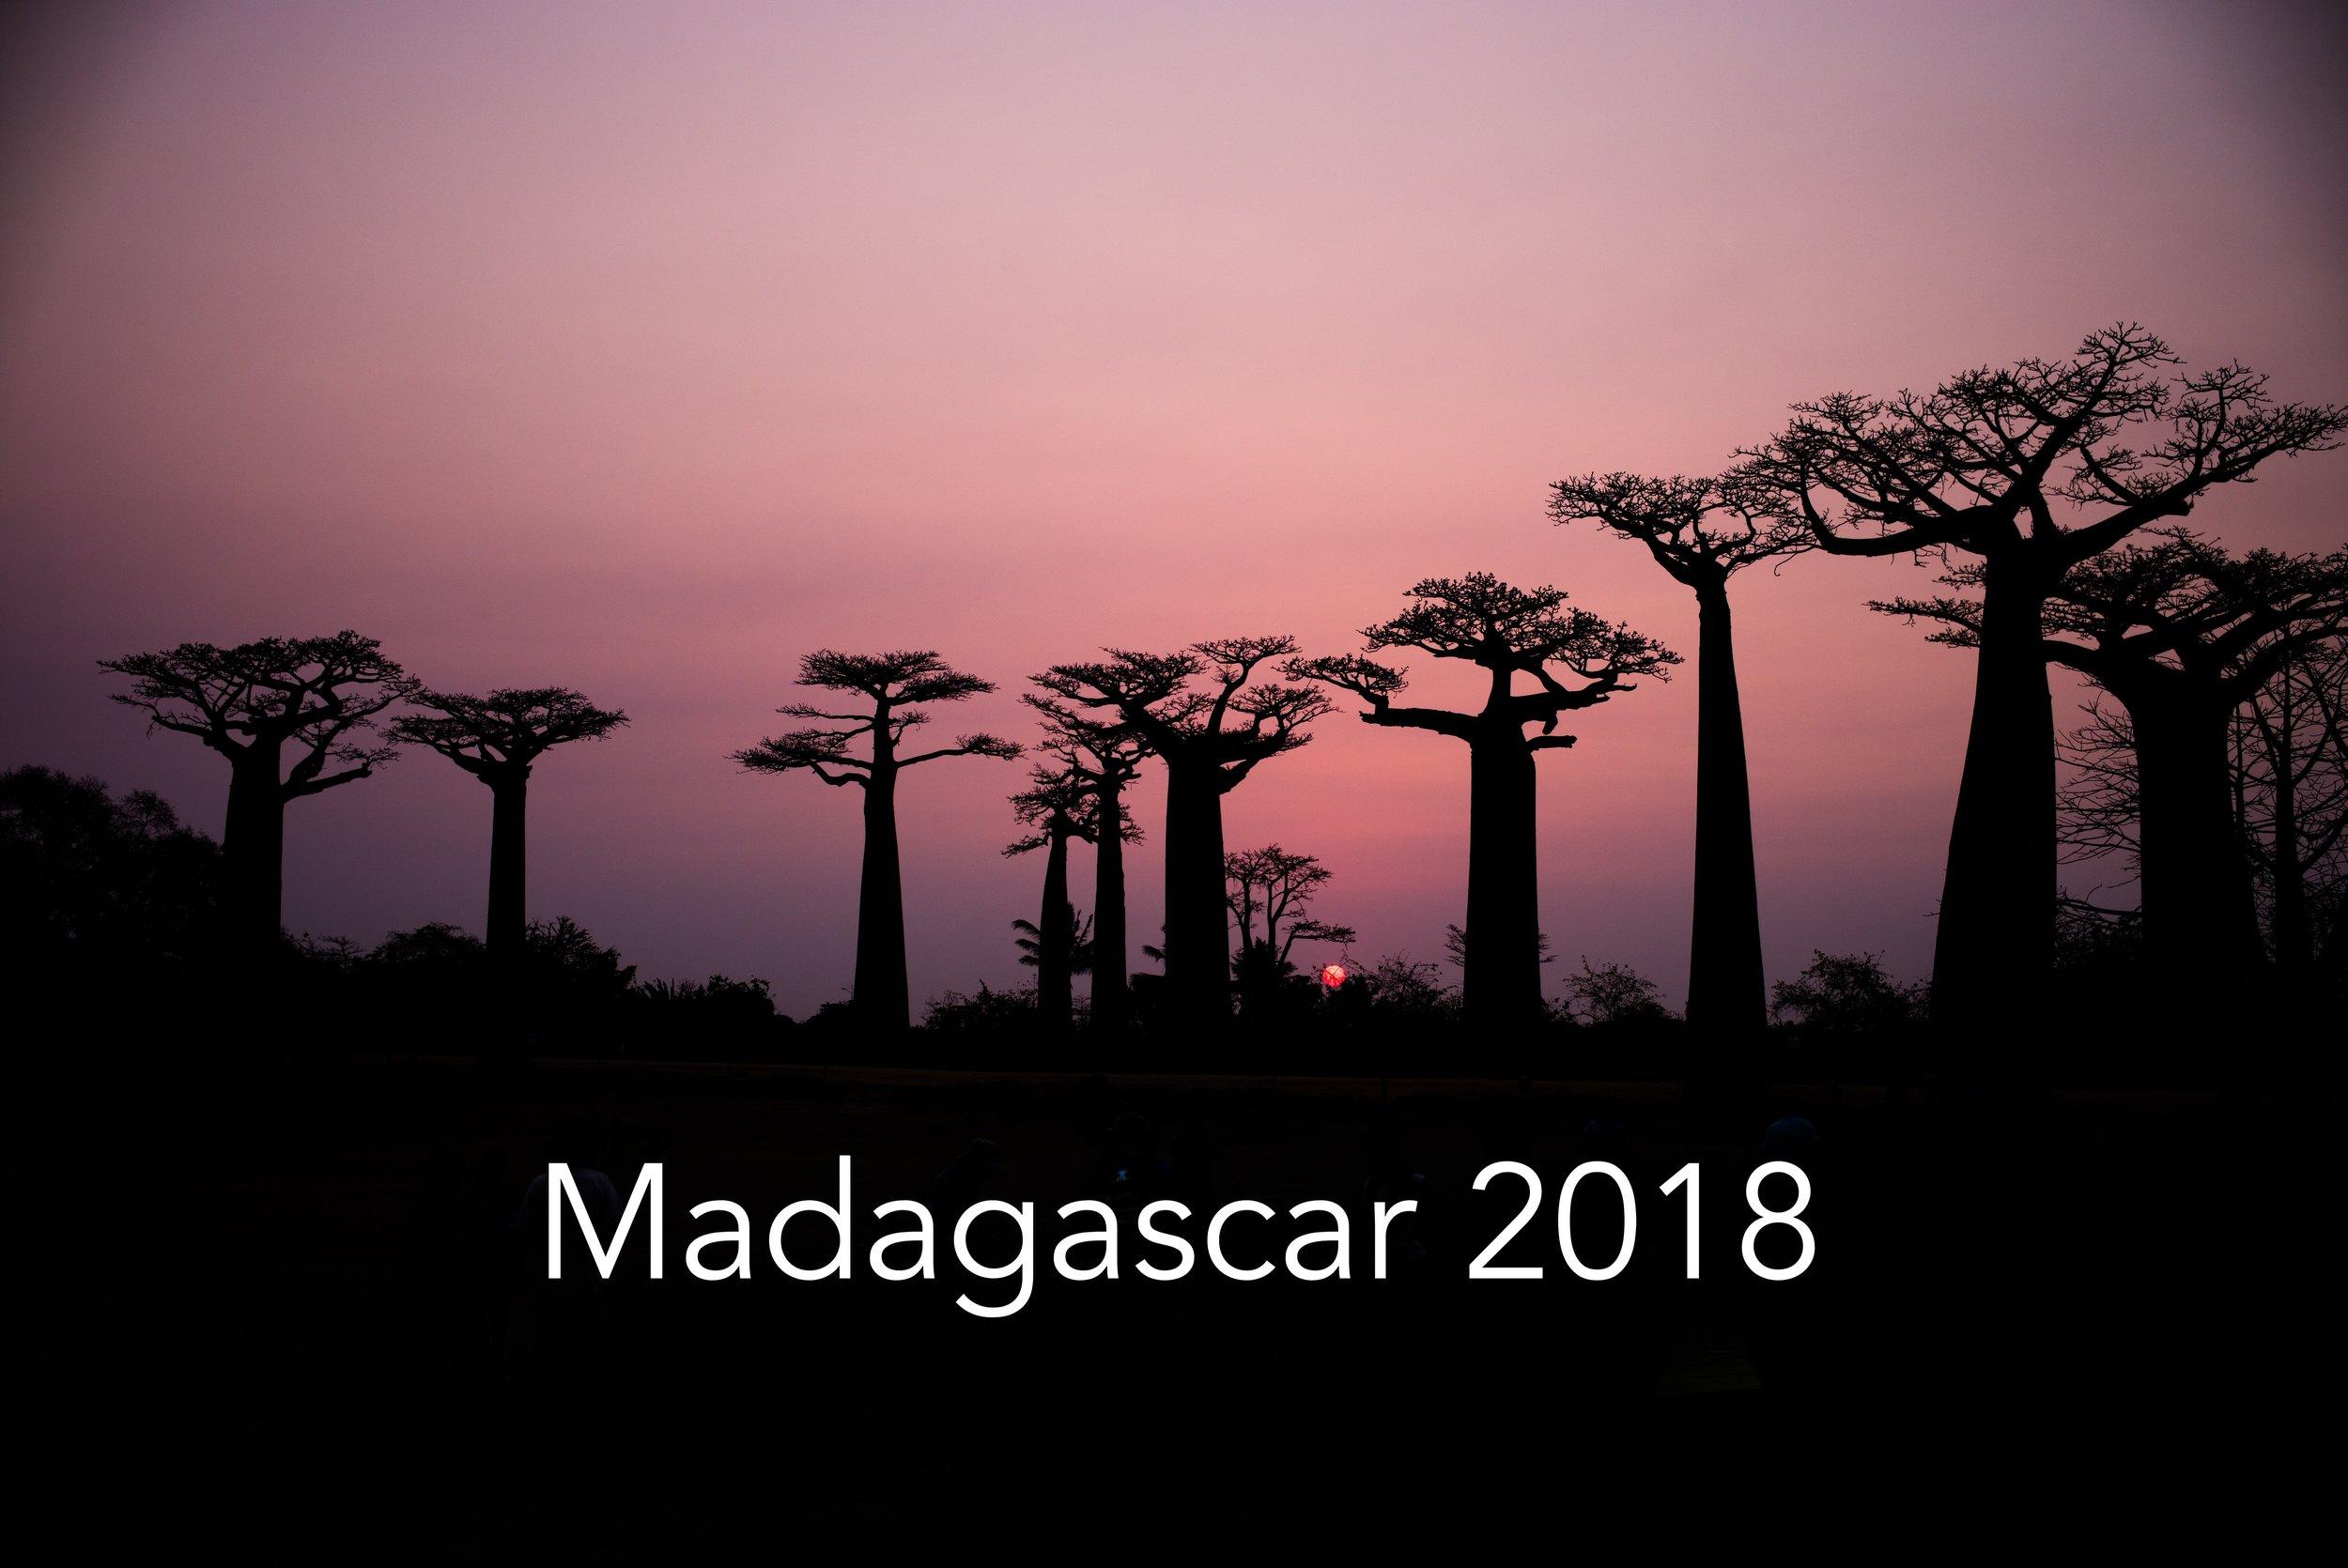 madagascar 2018 photop .jpg